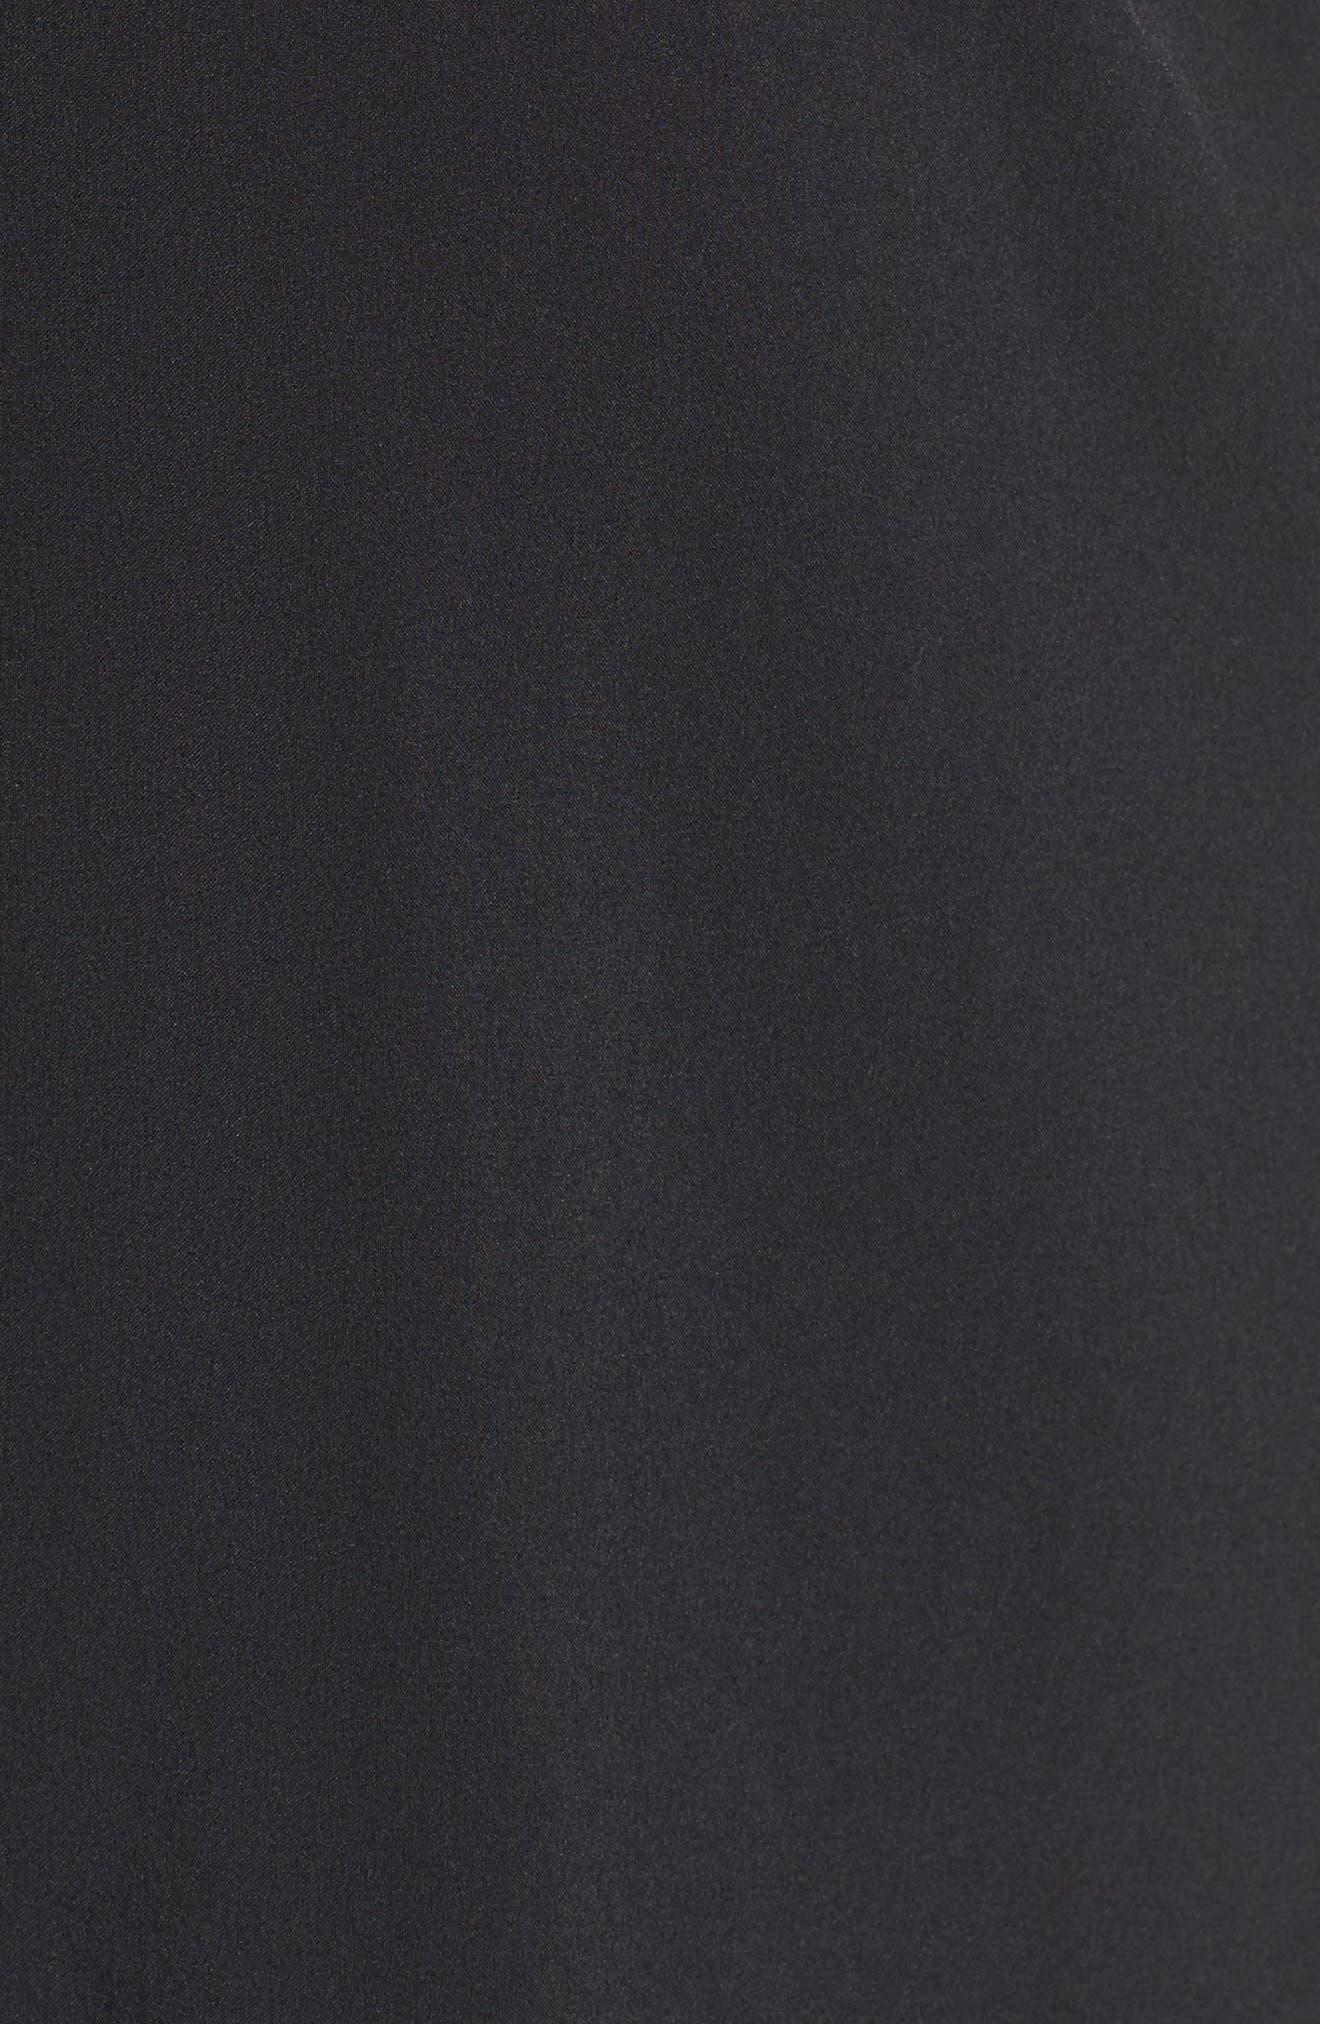 Speedwick Speed Training Shorts,                             Alternate thumbnail 5, color,                             BLACK